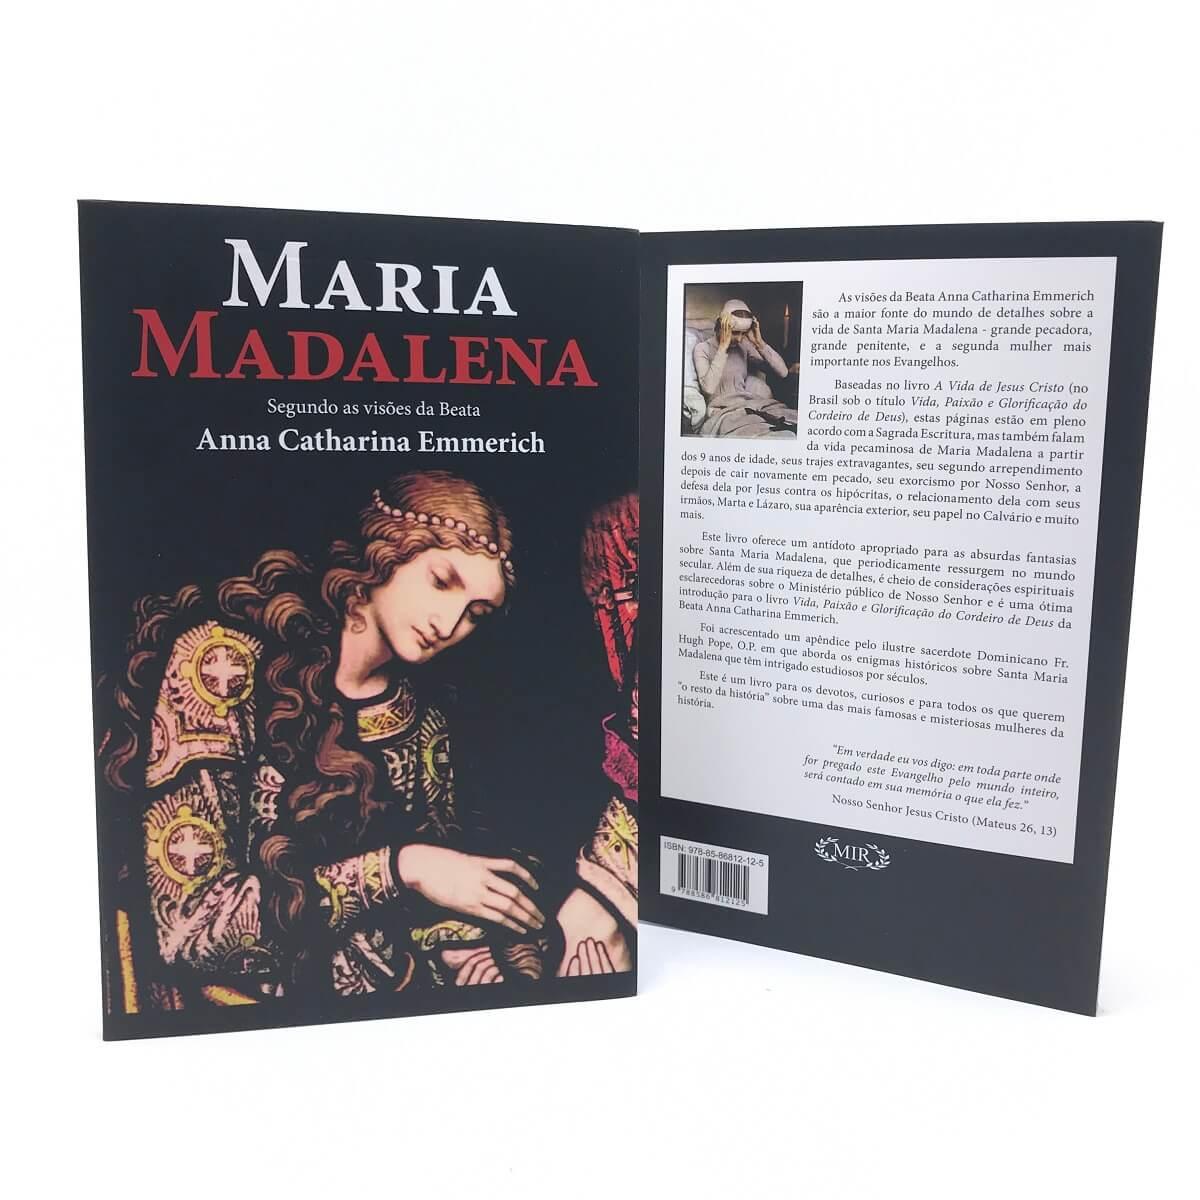 Livro Maria Madalena - Ana Catarina Emmerich